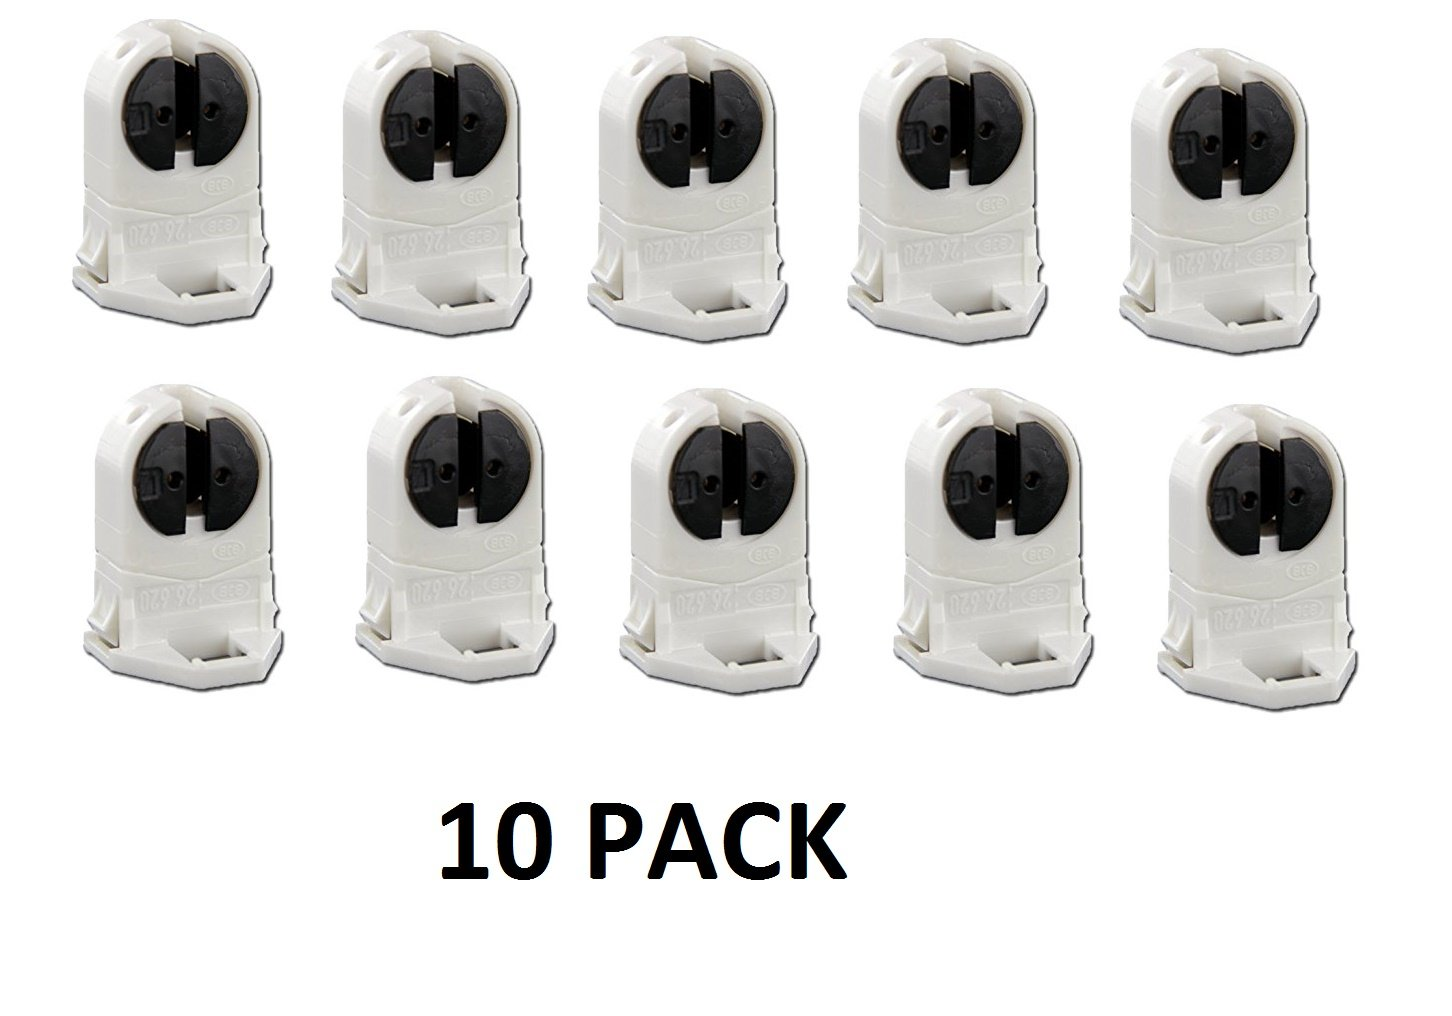 10 PACK - UL LISTED LH0842 BJB 26.620.2006.50 TALL UNSHUNTED T5 MINIATURE BIPIN ROTARY LOCKING LAMP HOLDER